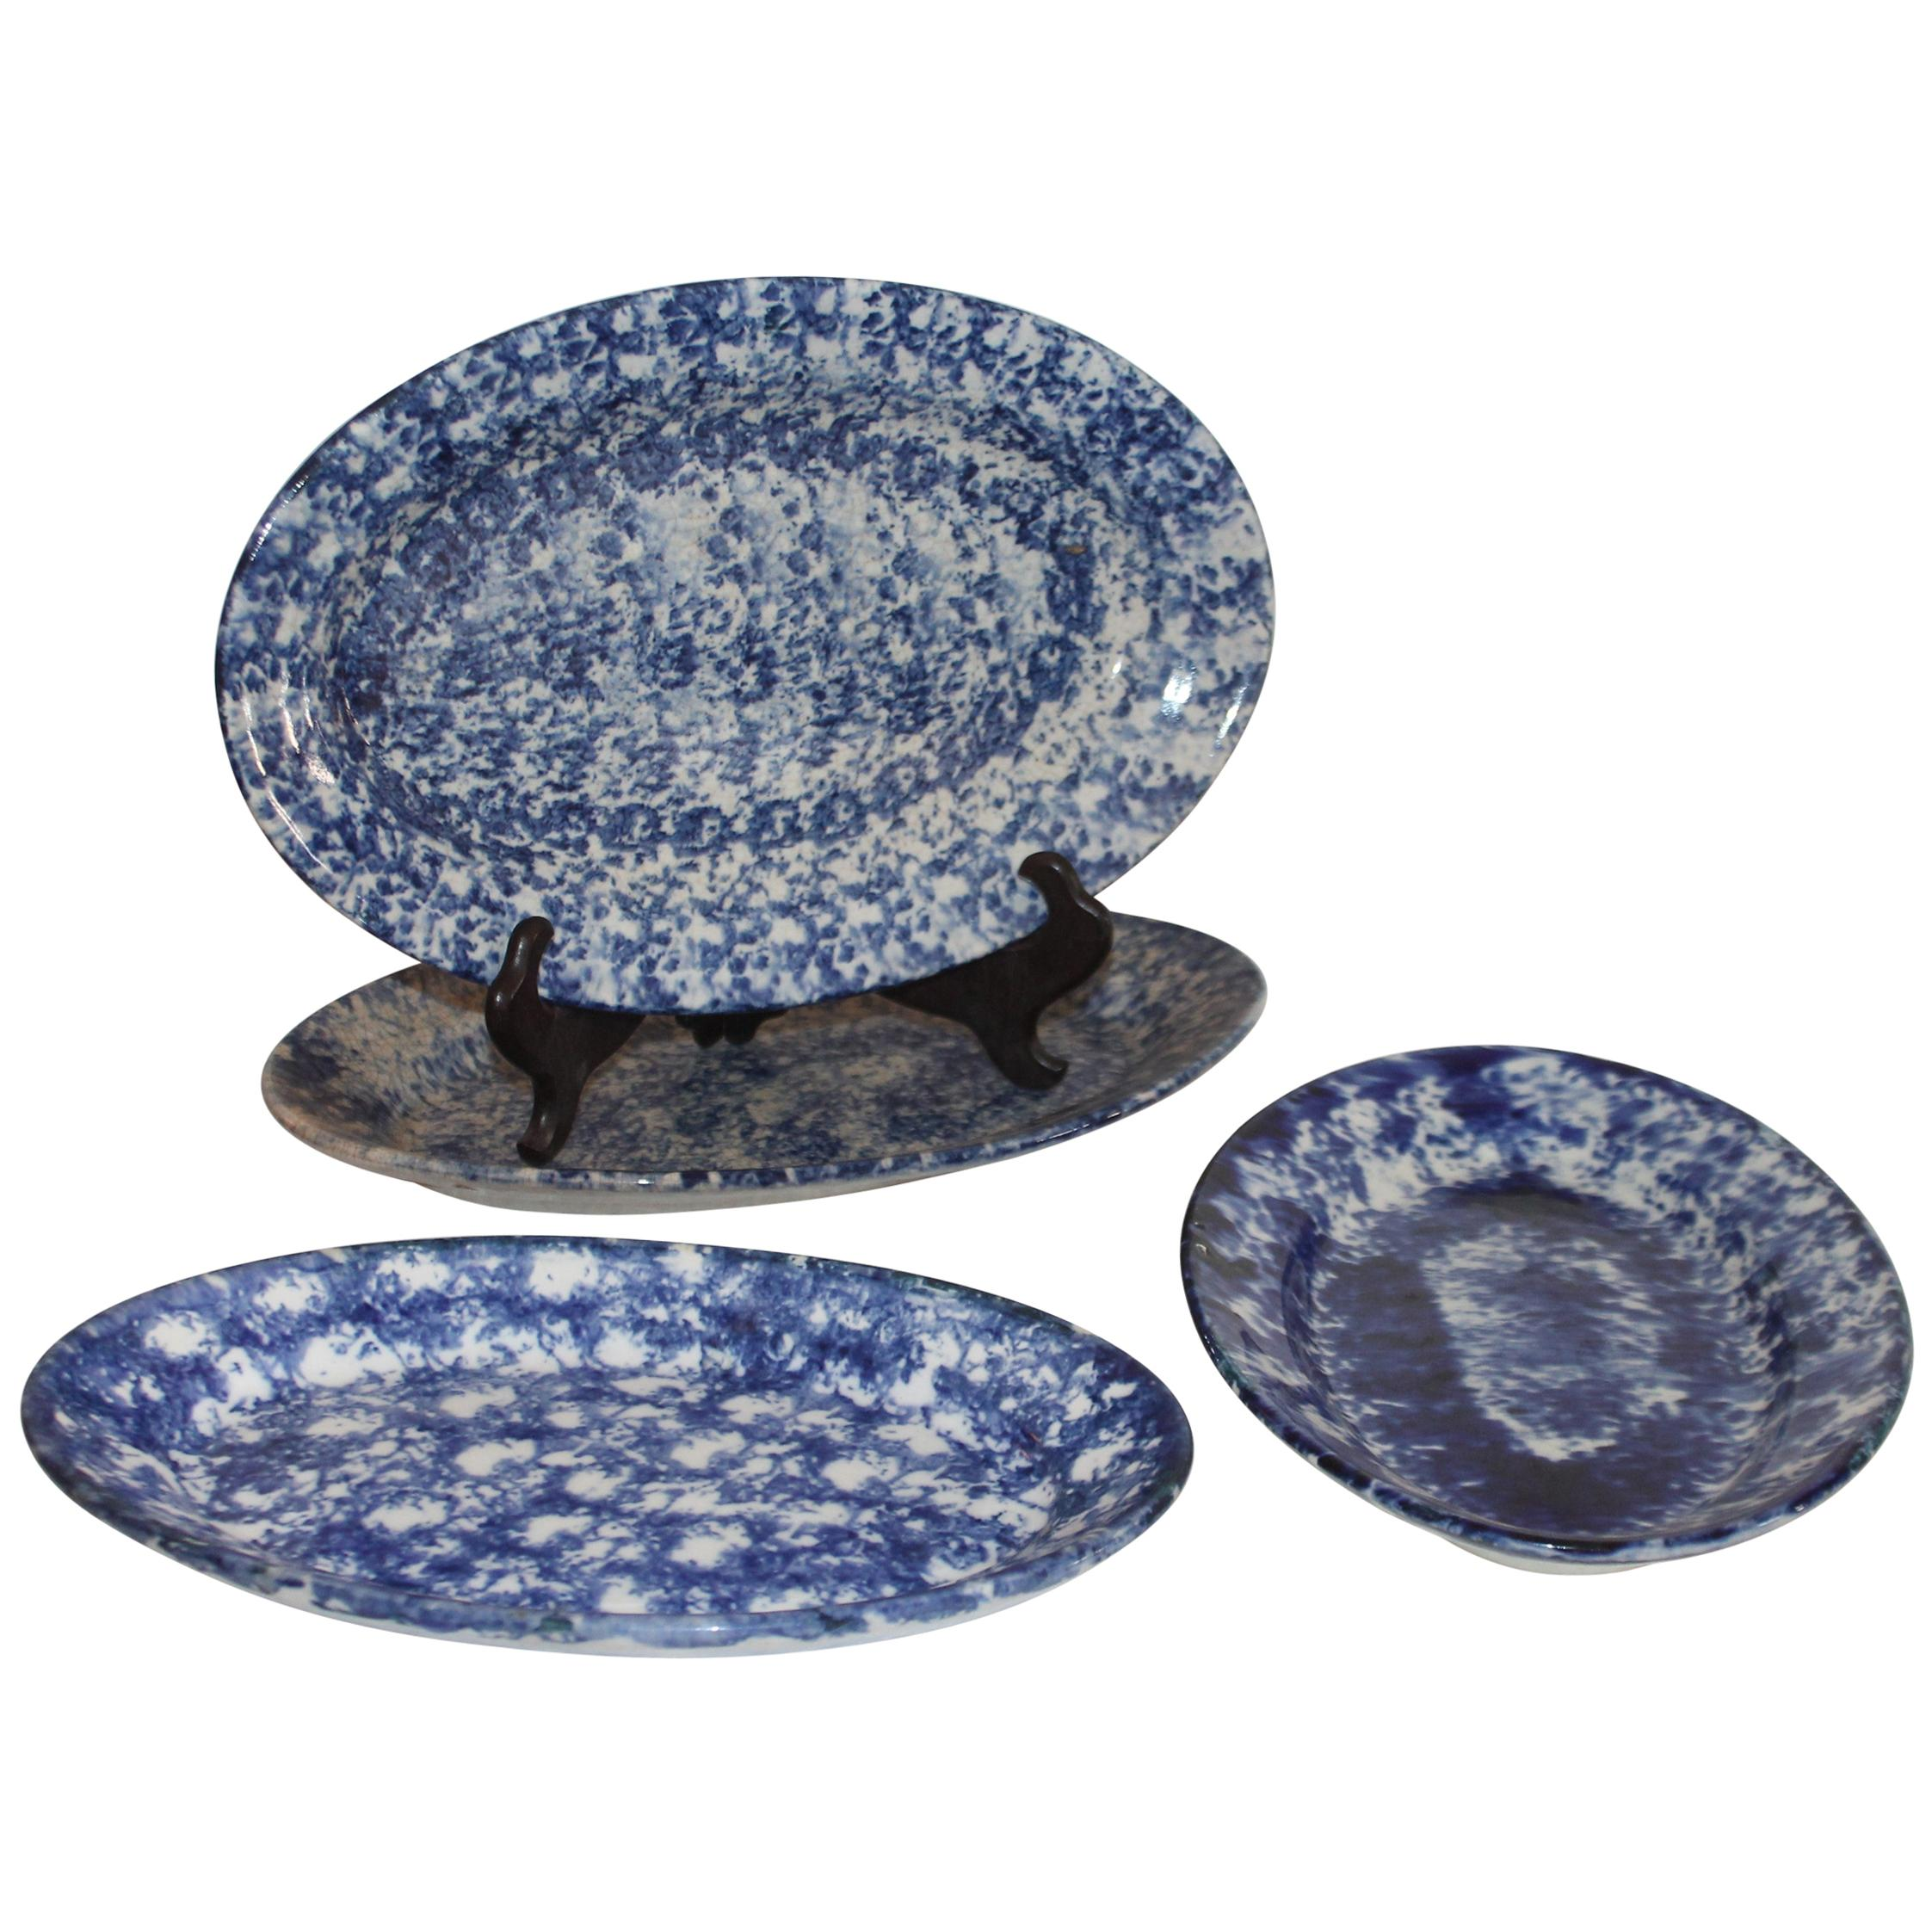 19th Century Sponge Ware Serving Platters, 5